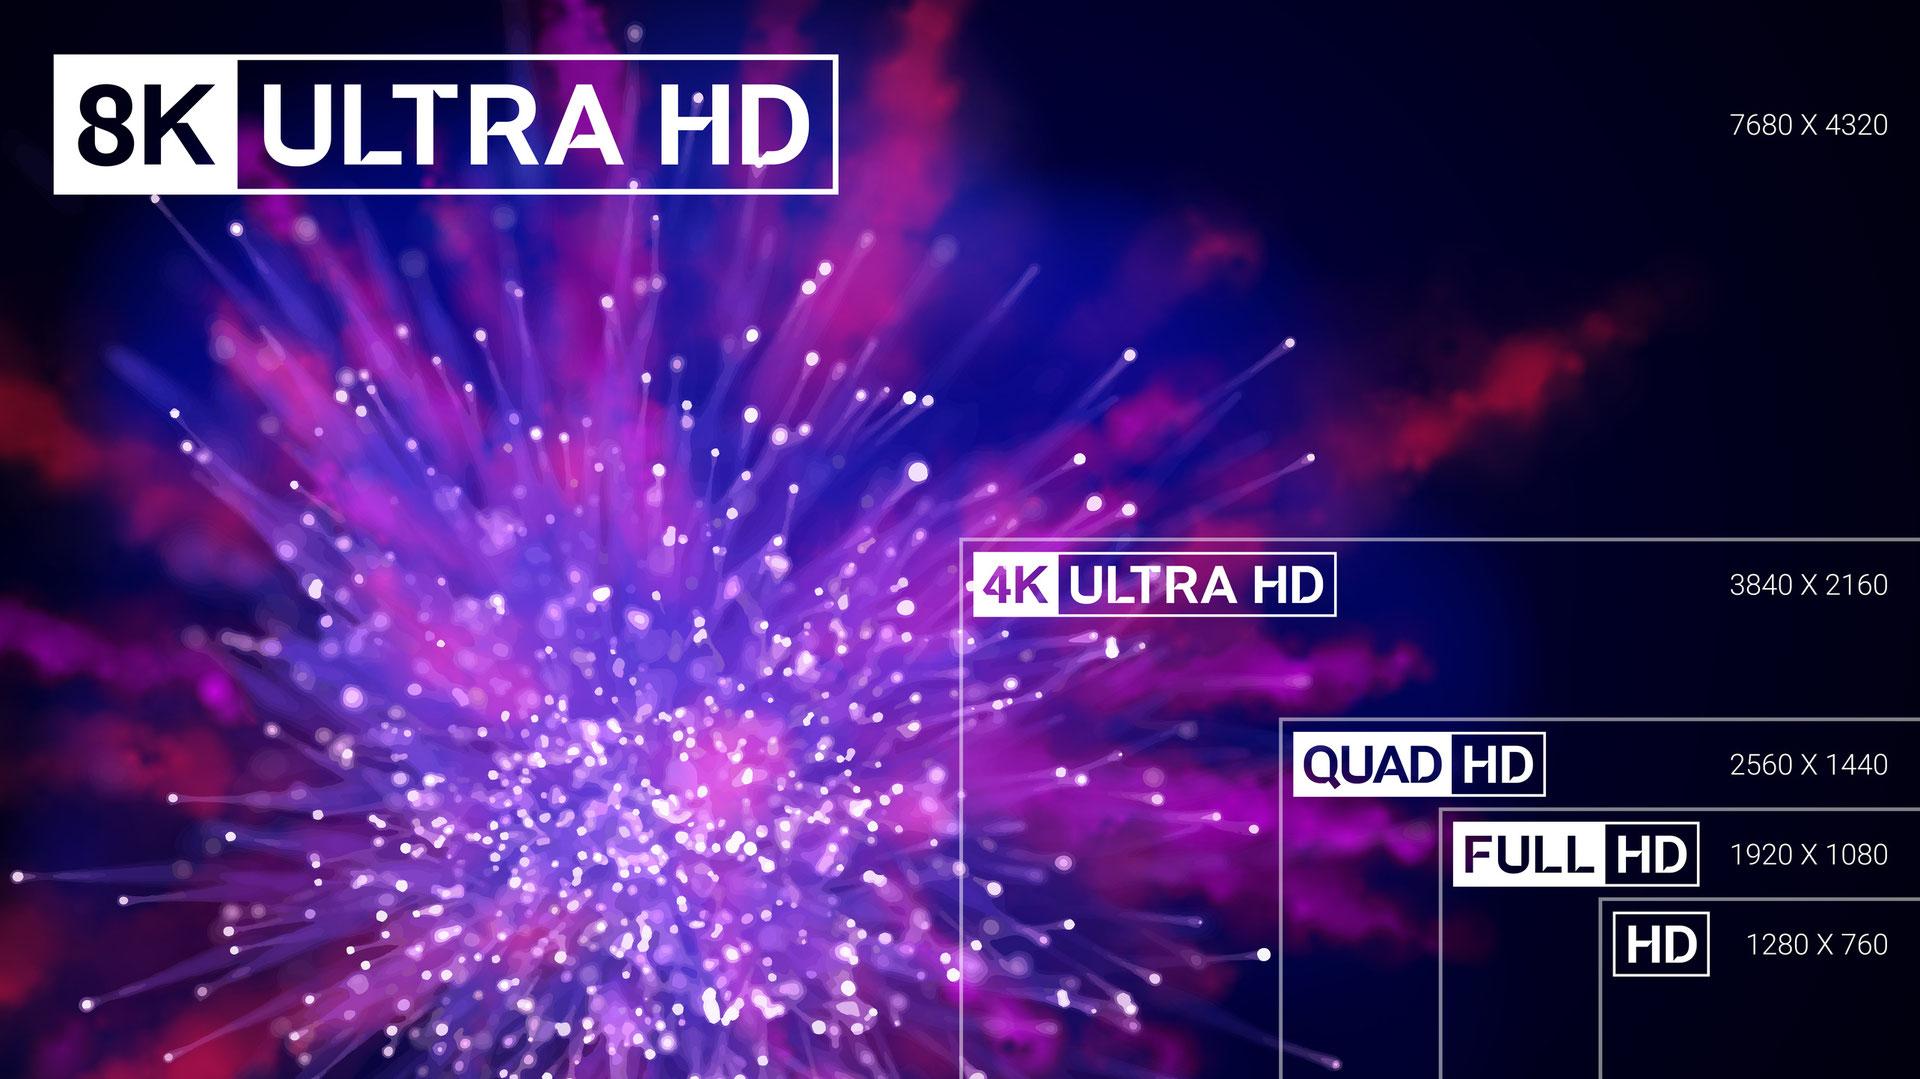 4k Auflösung 38402160 Pixel Ohne Teuren Kabeltausch Safetech